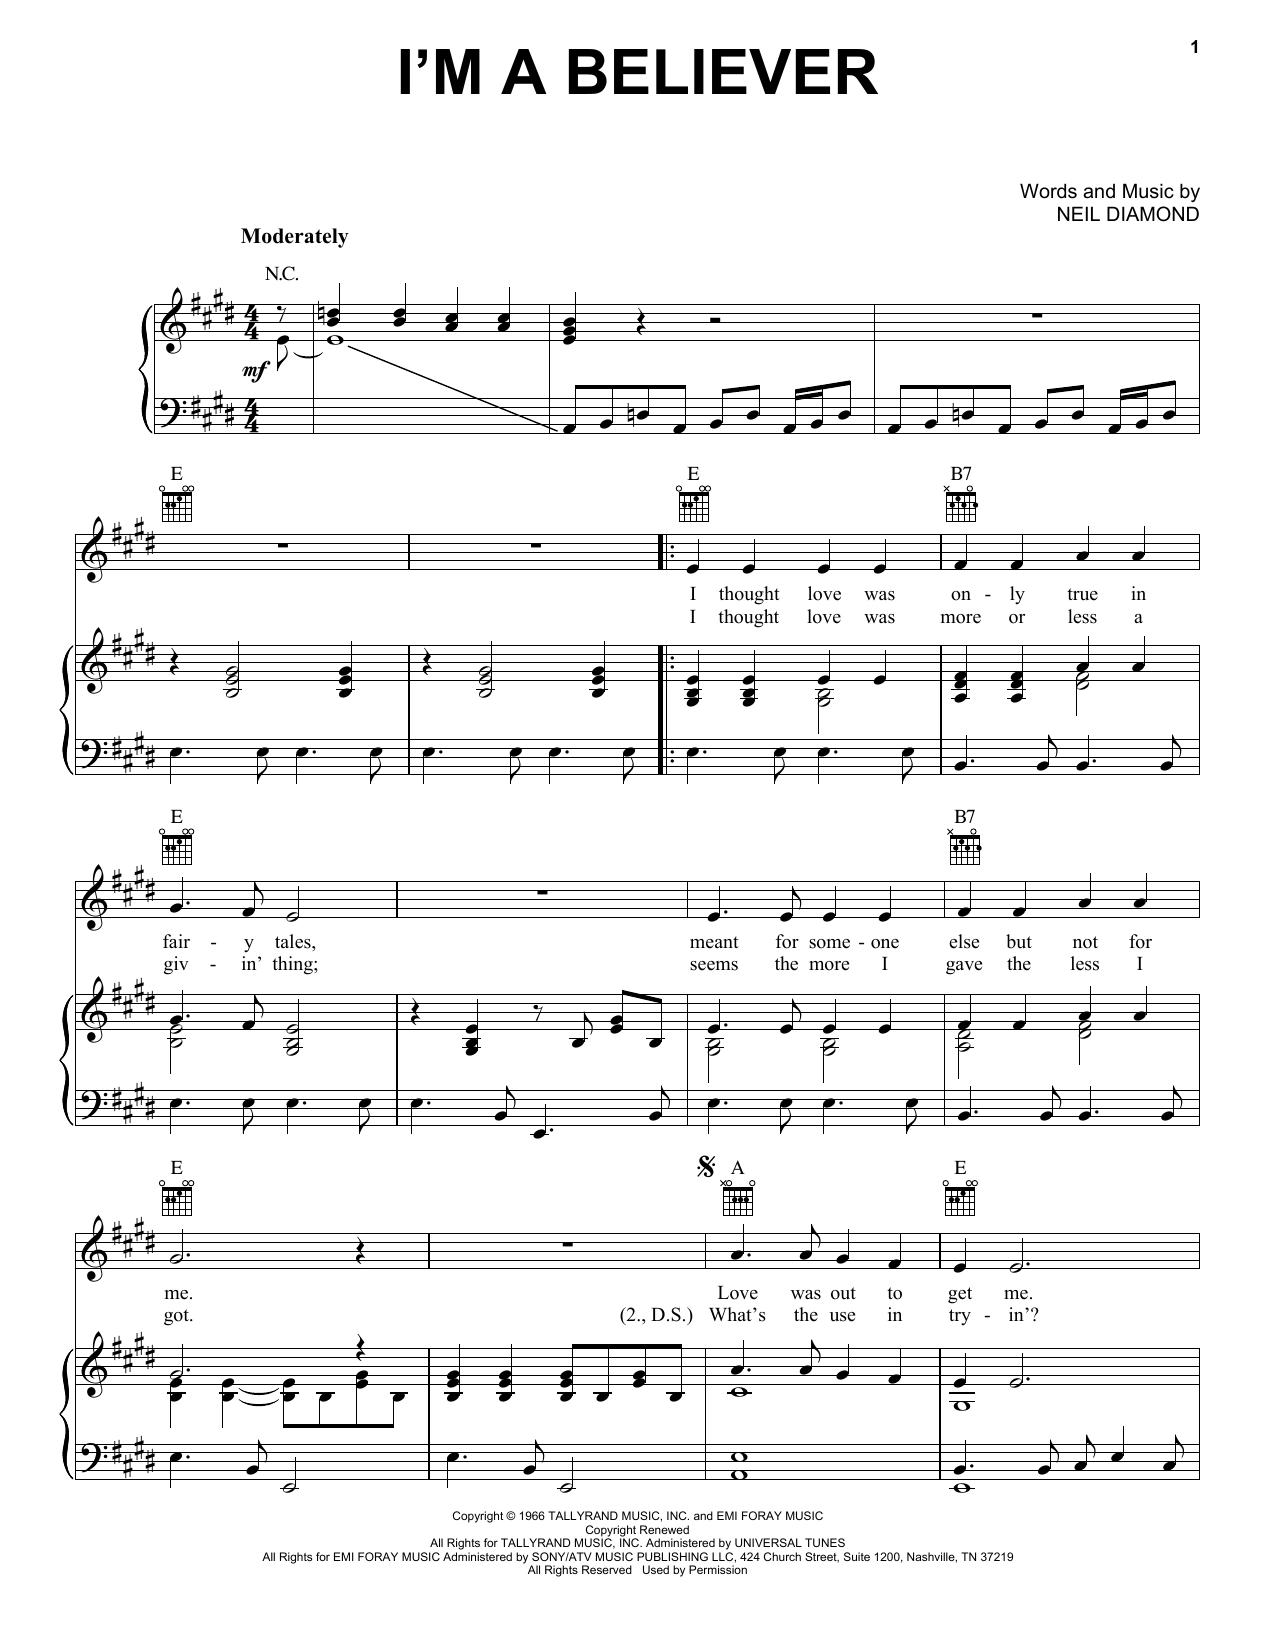 I'm A Believer sheet music